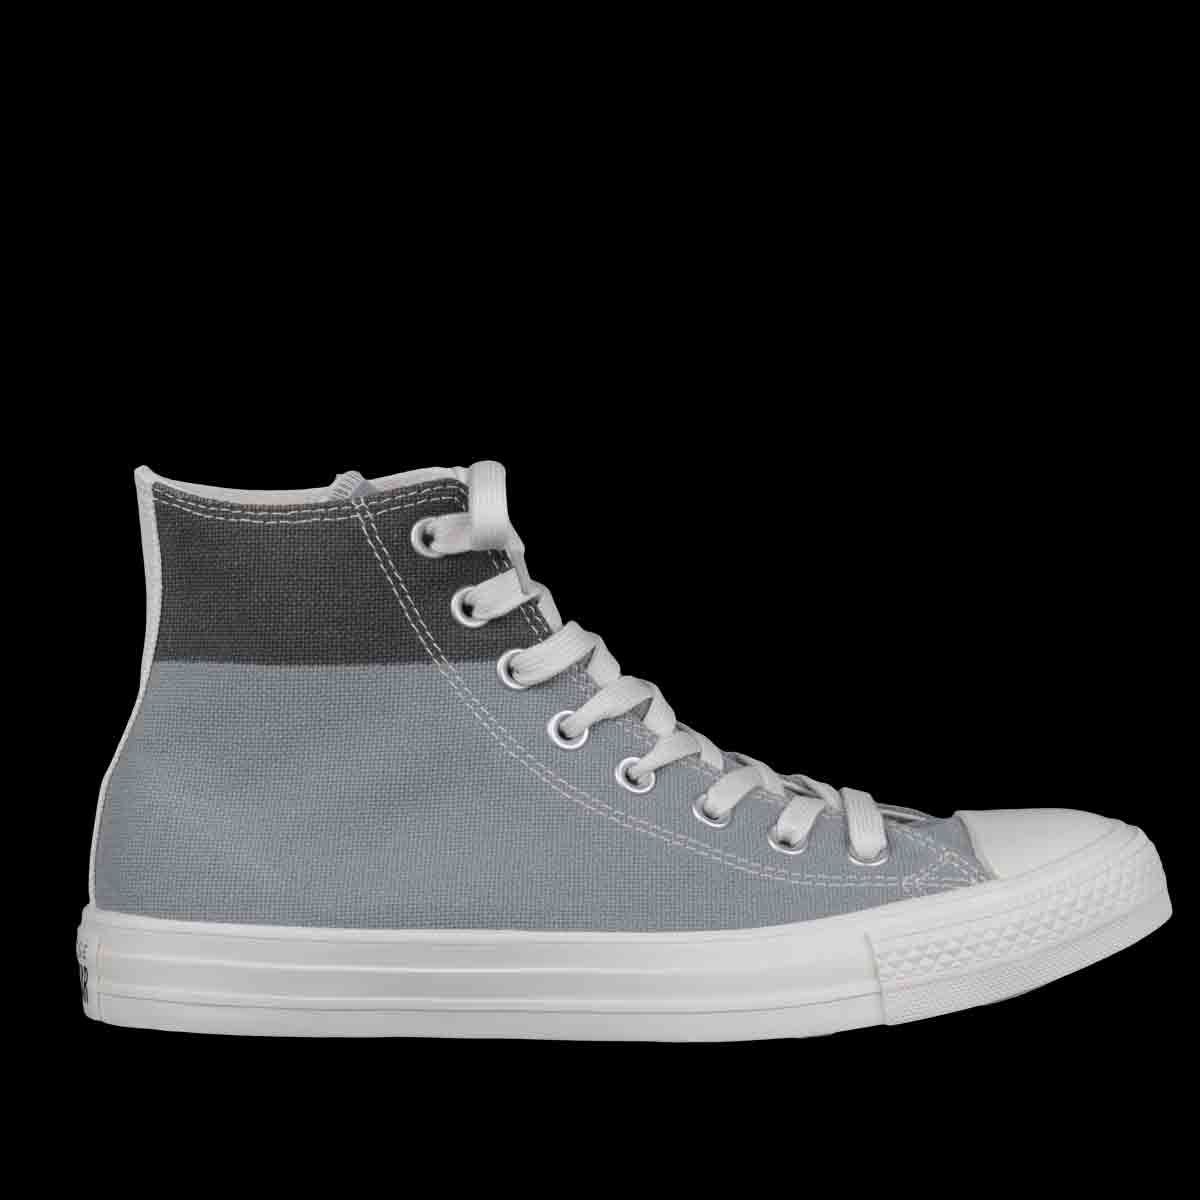 Converse Chuck Taylor All Star Hi Jute Cool Grey